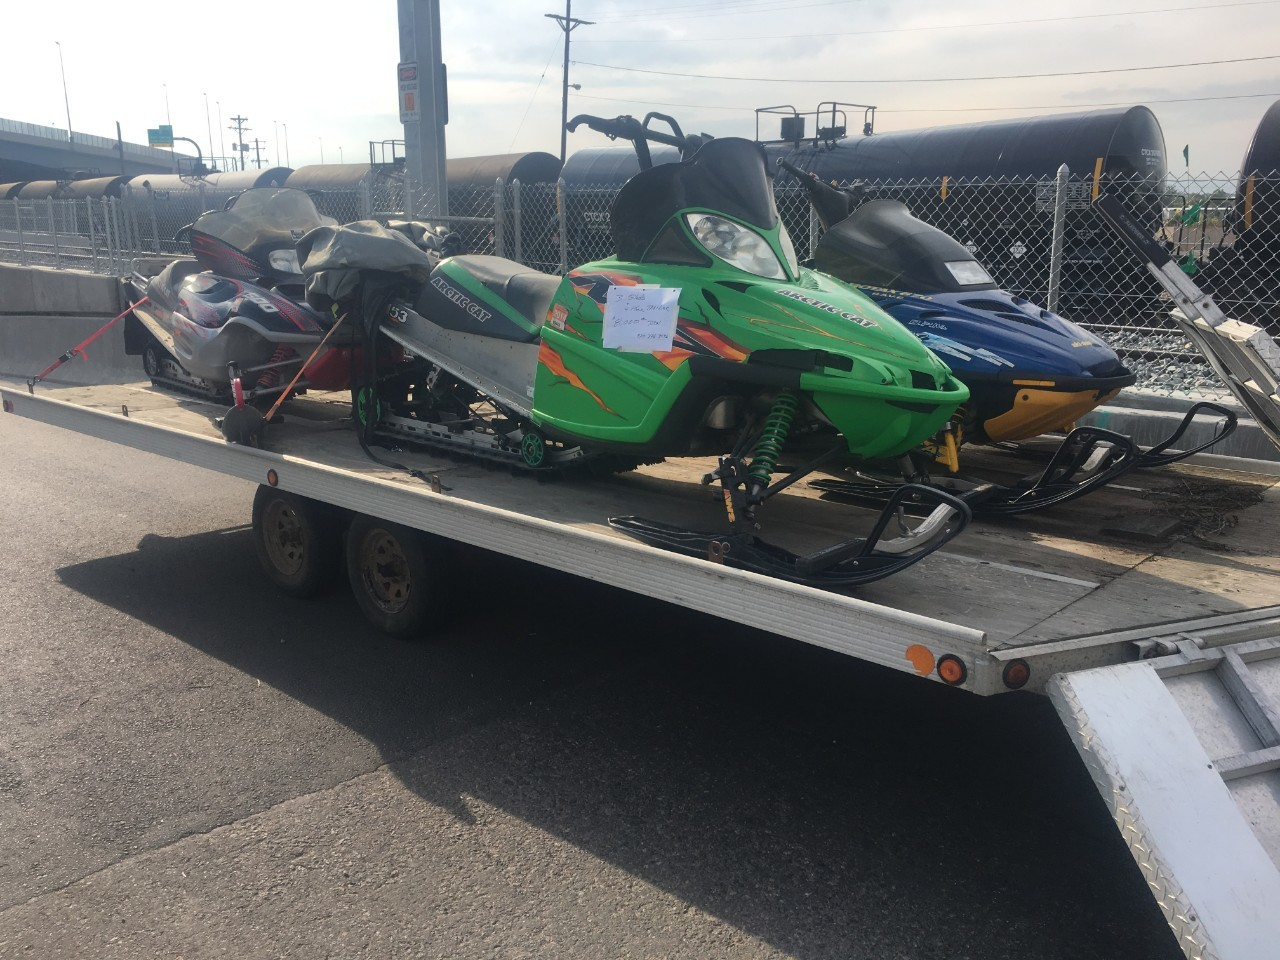 Colorado Atvs For Sale 1710 Near Me Atv Trader Honda Pioneer Cargo Tray